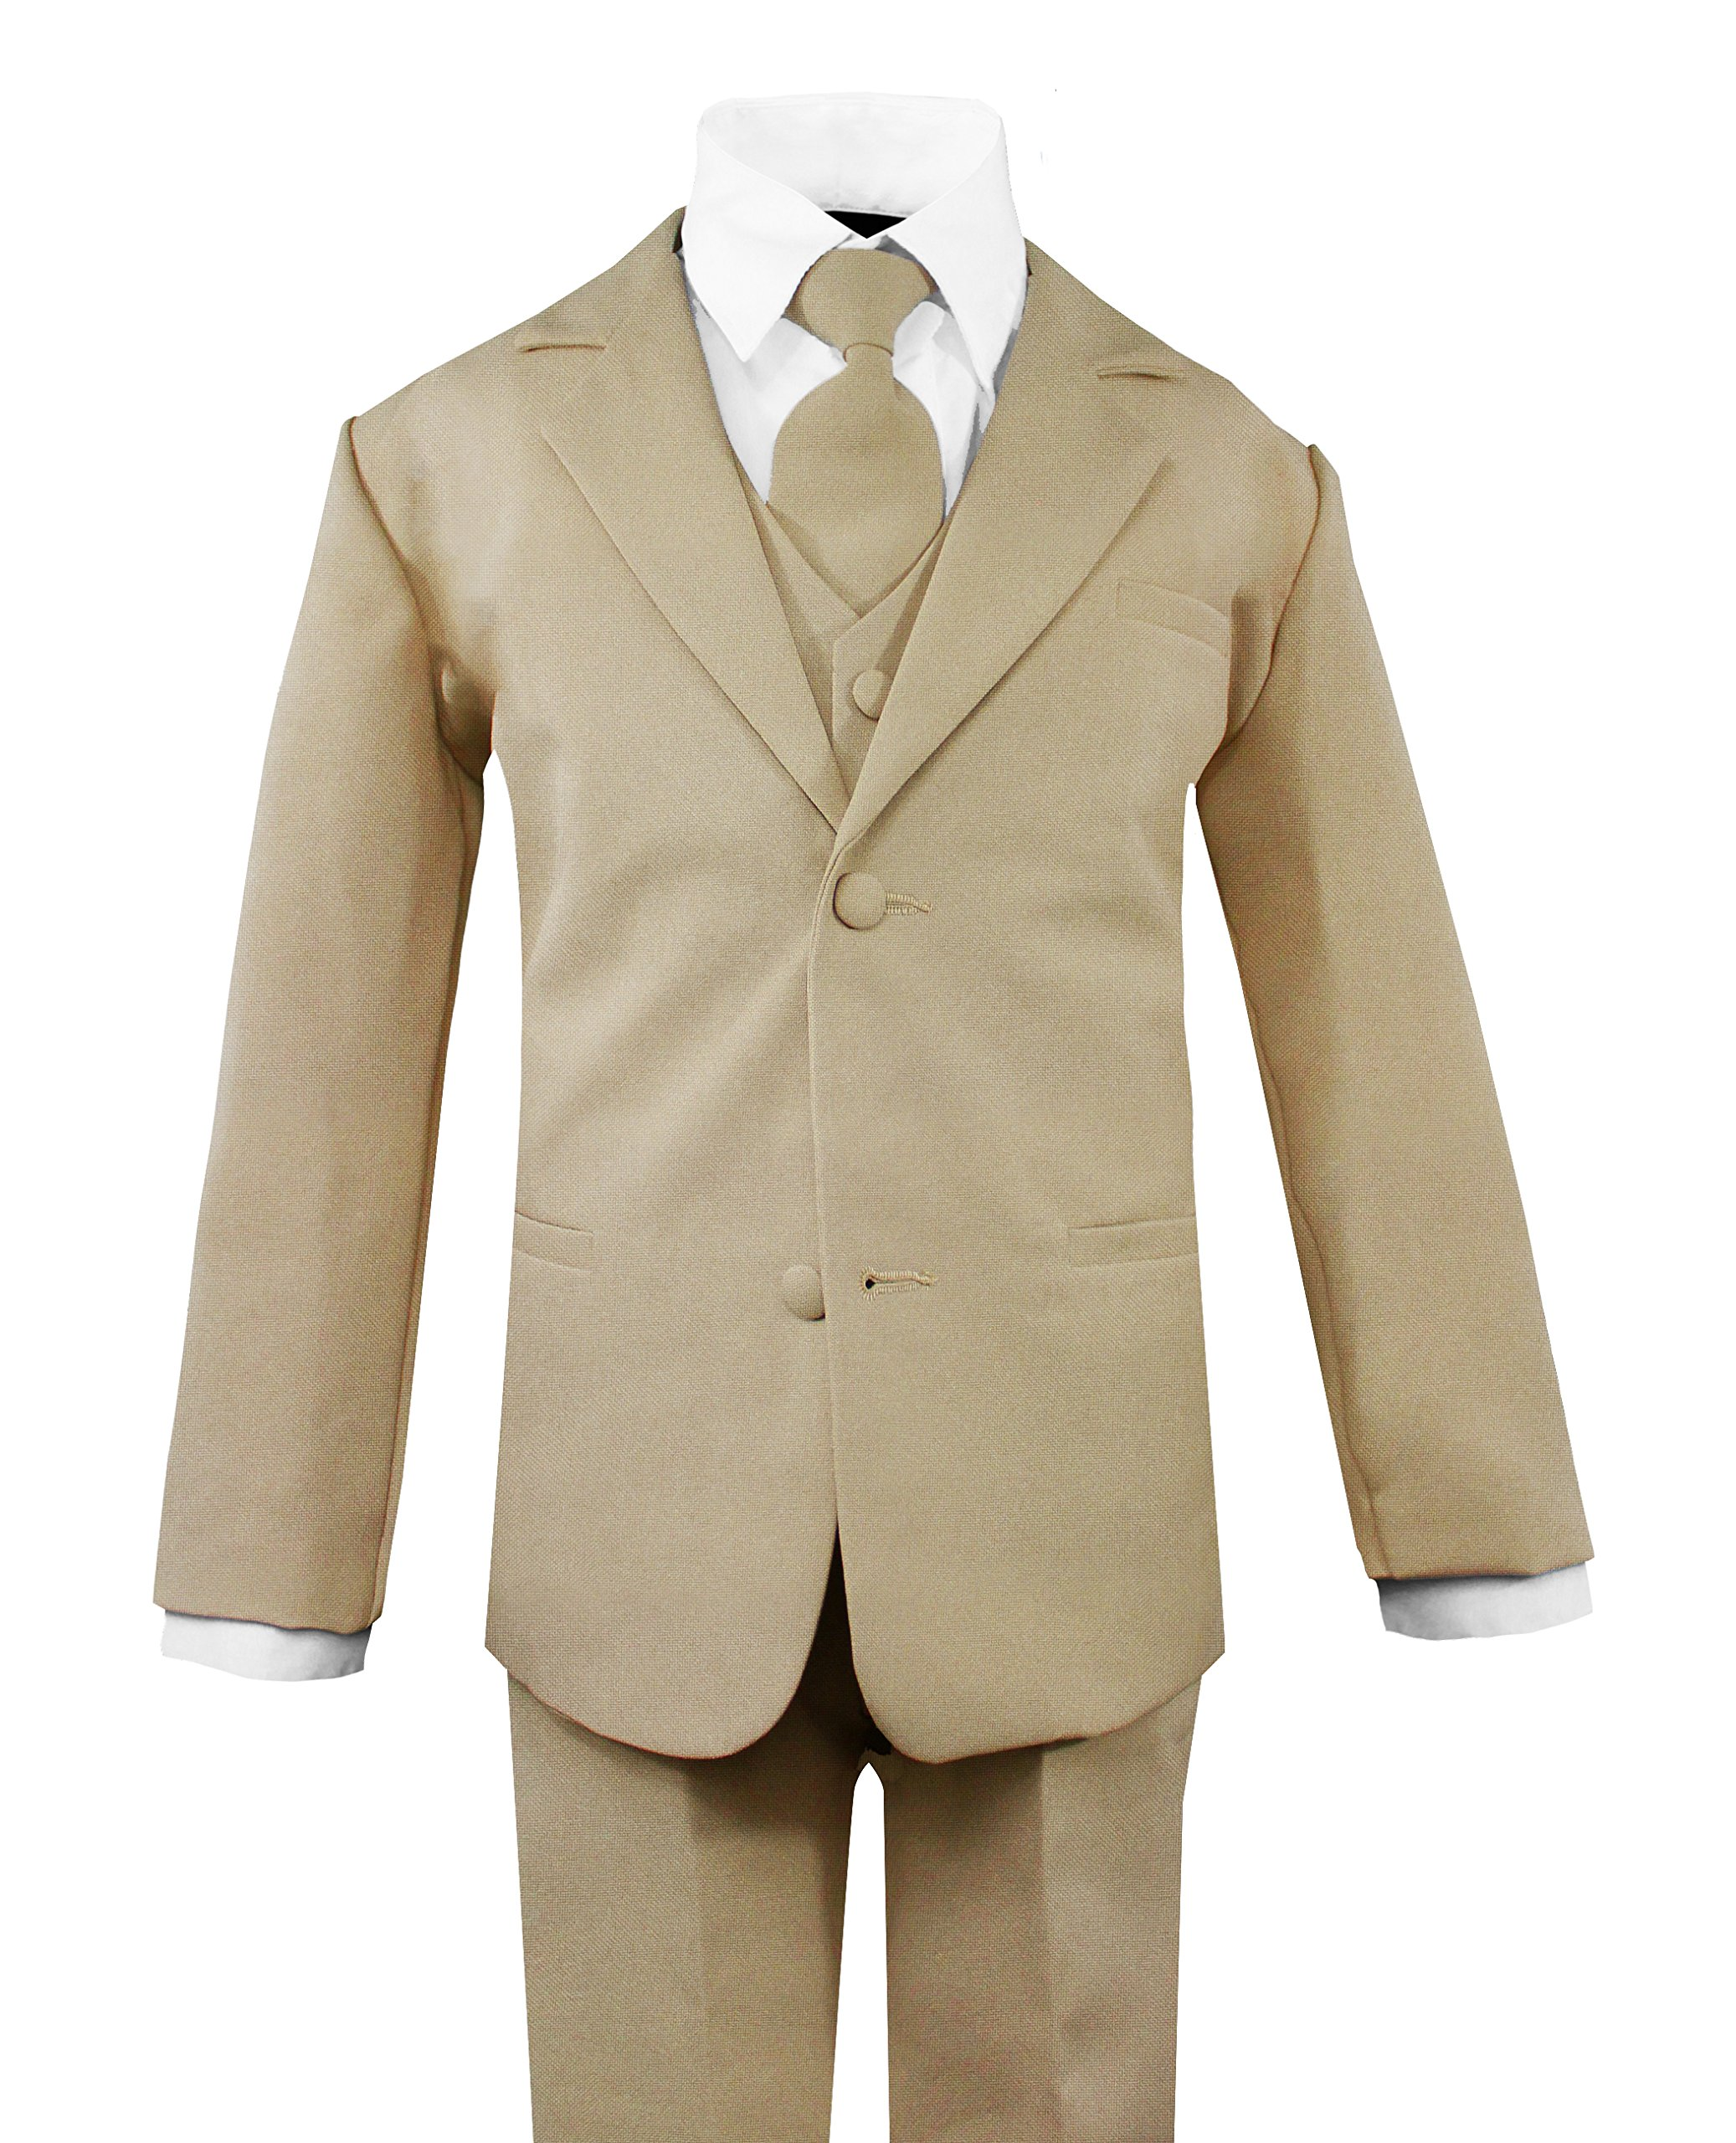 Luca Gabriel Toddler Boys' 5 Piece Classic Fit No Tail Formal Khaki Dress Suit Set with Tie and Vest - Size 7